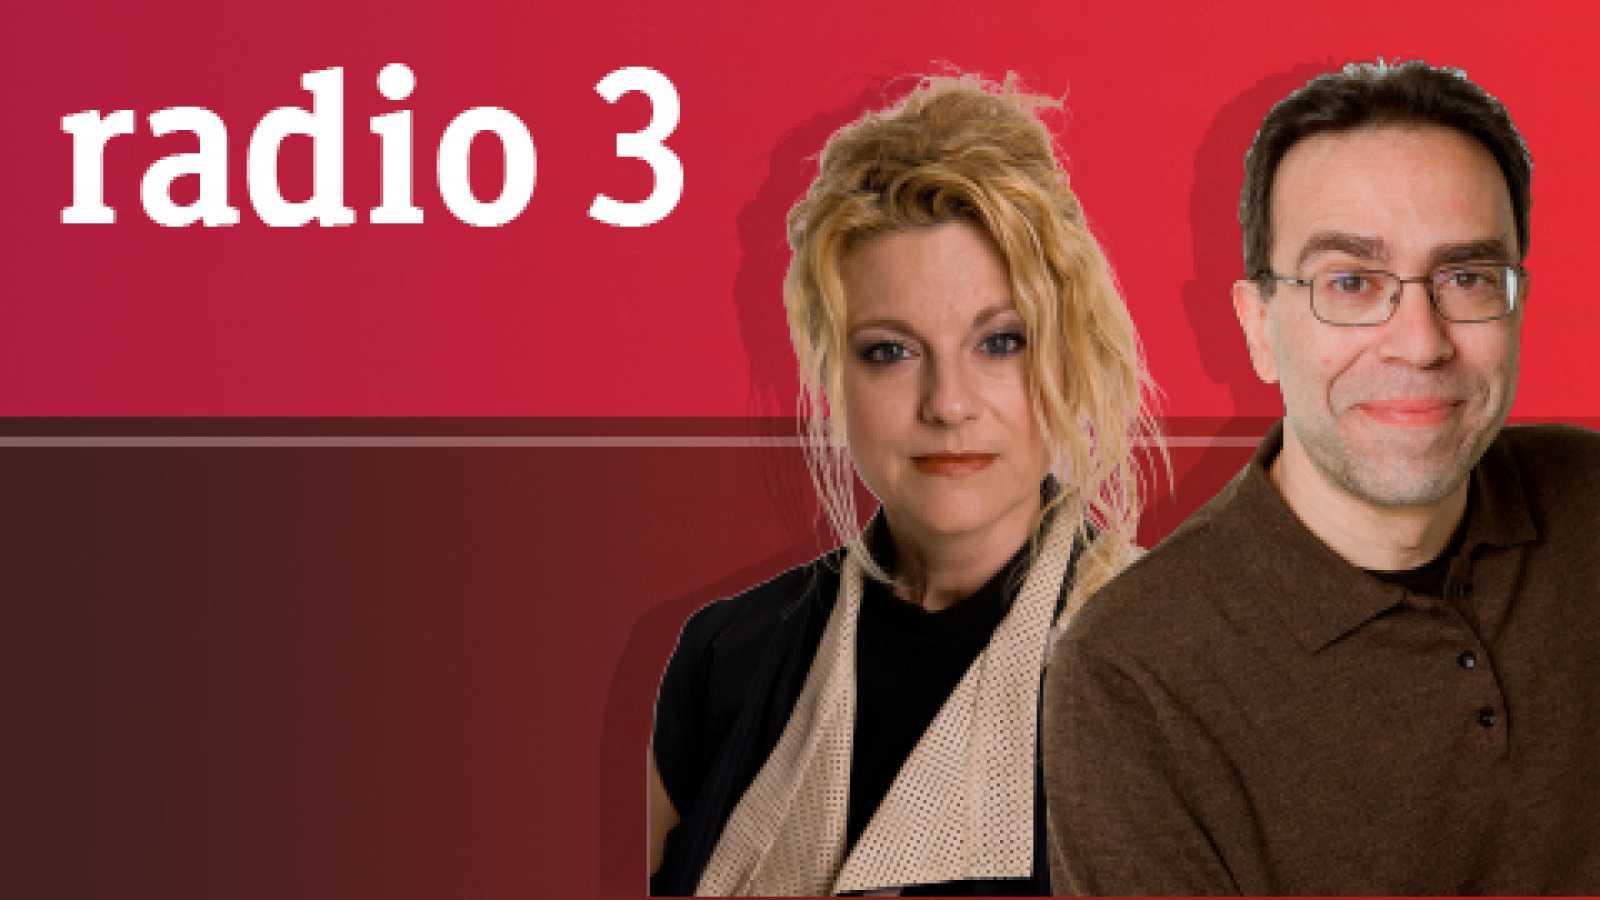 La Madeja - Favoritos Italianos - 08/09/13 - escuchar ahora